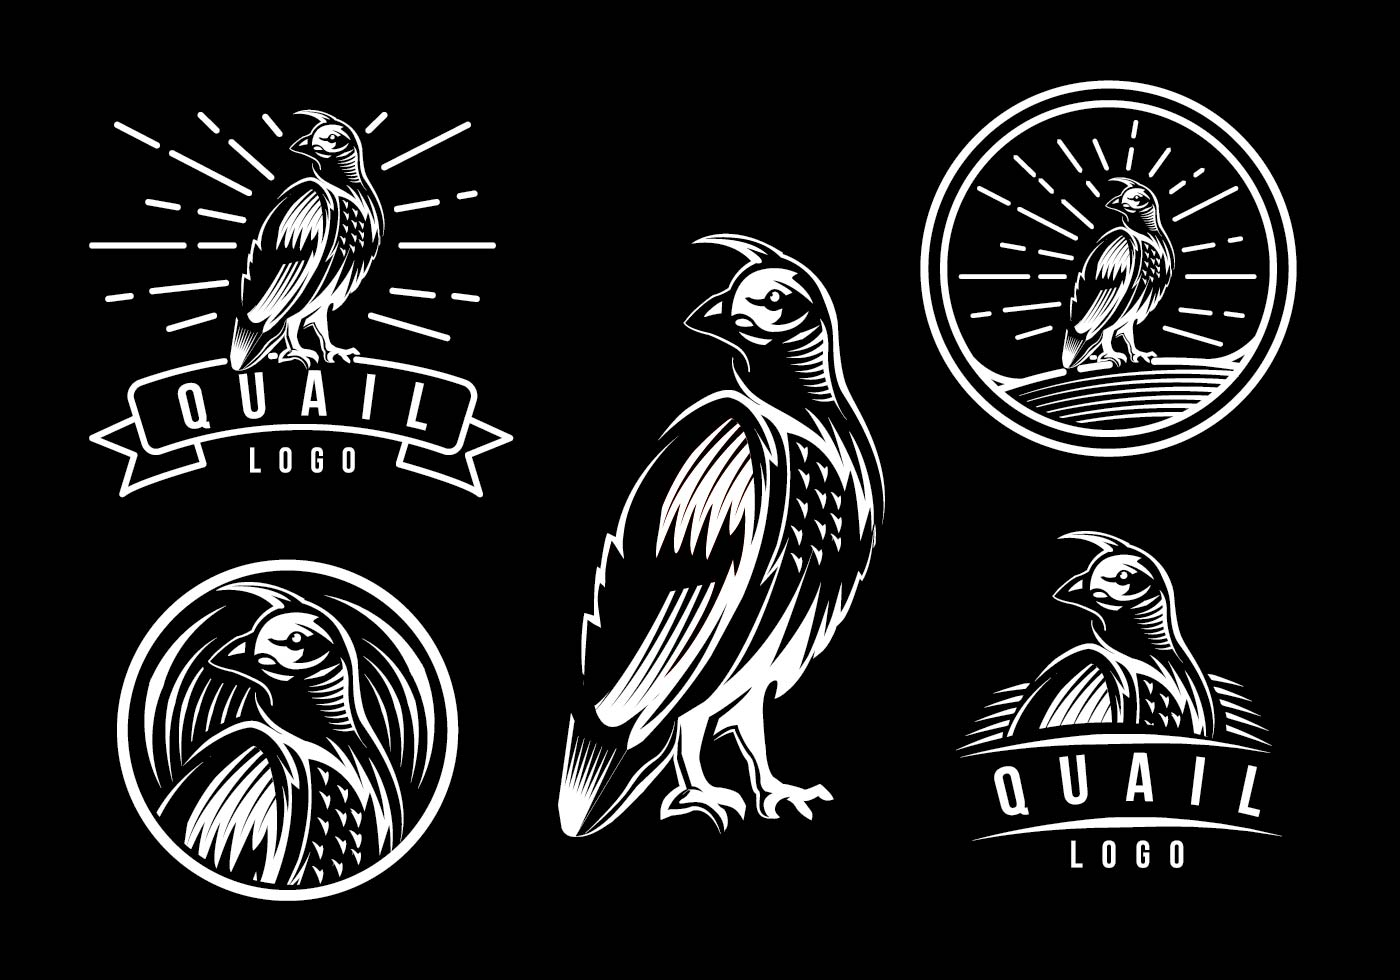 quail logo template download free vector art stock